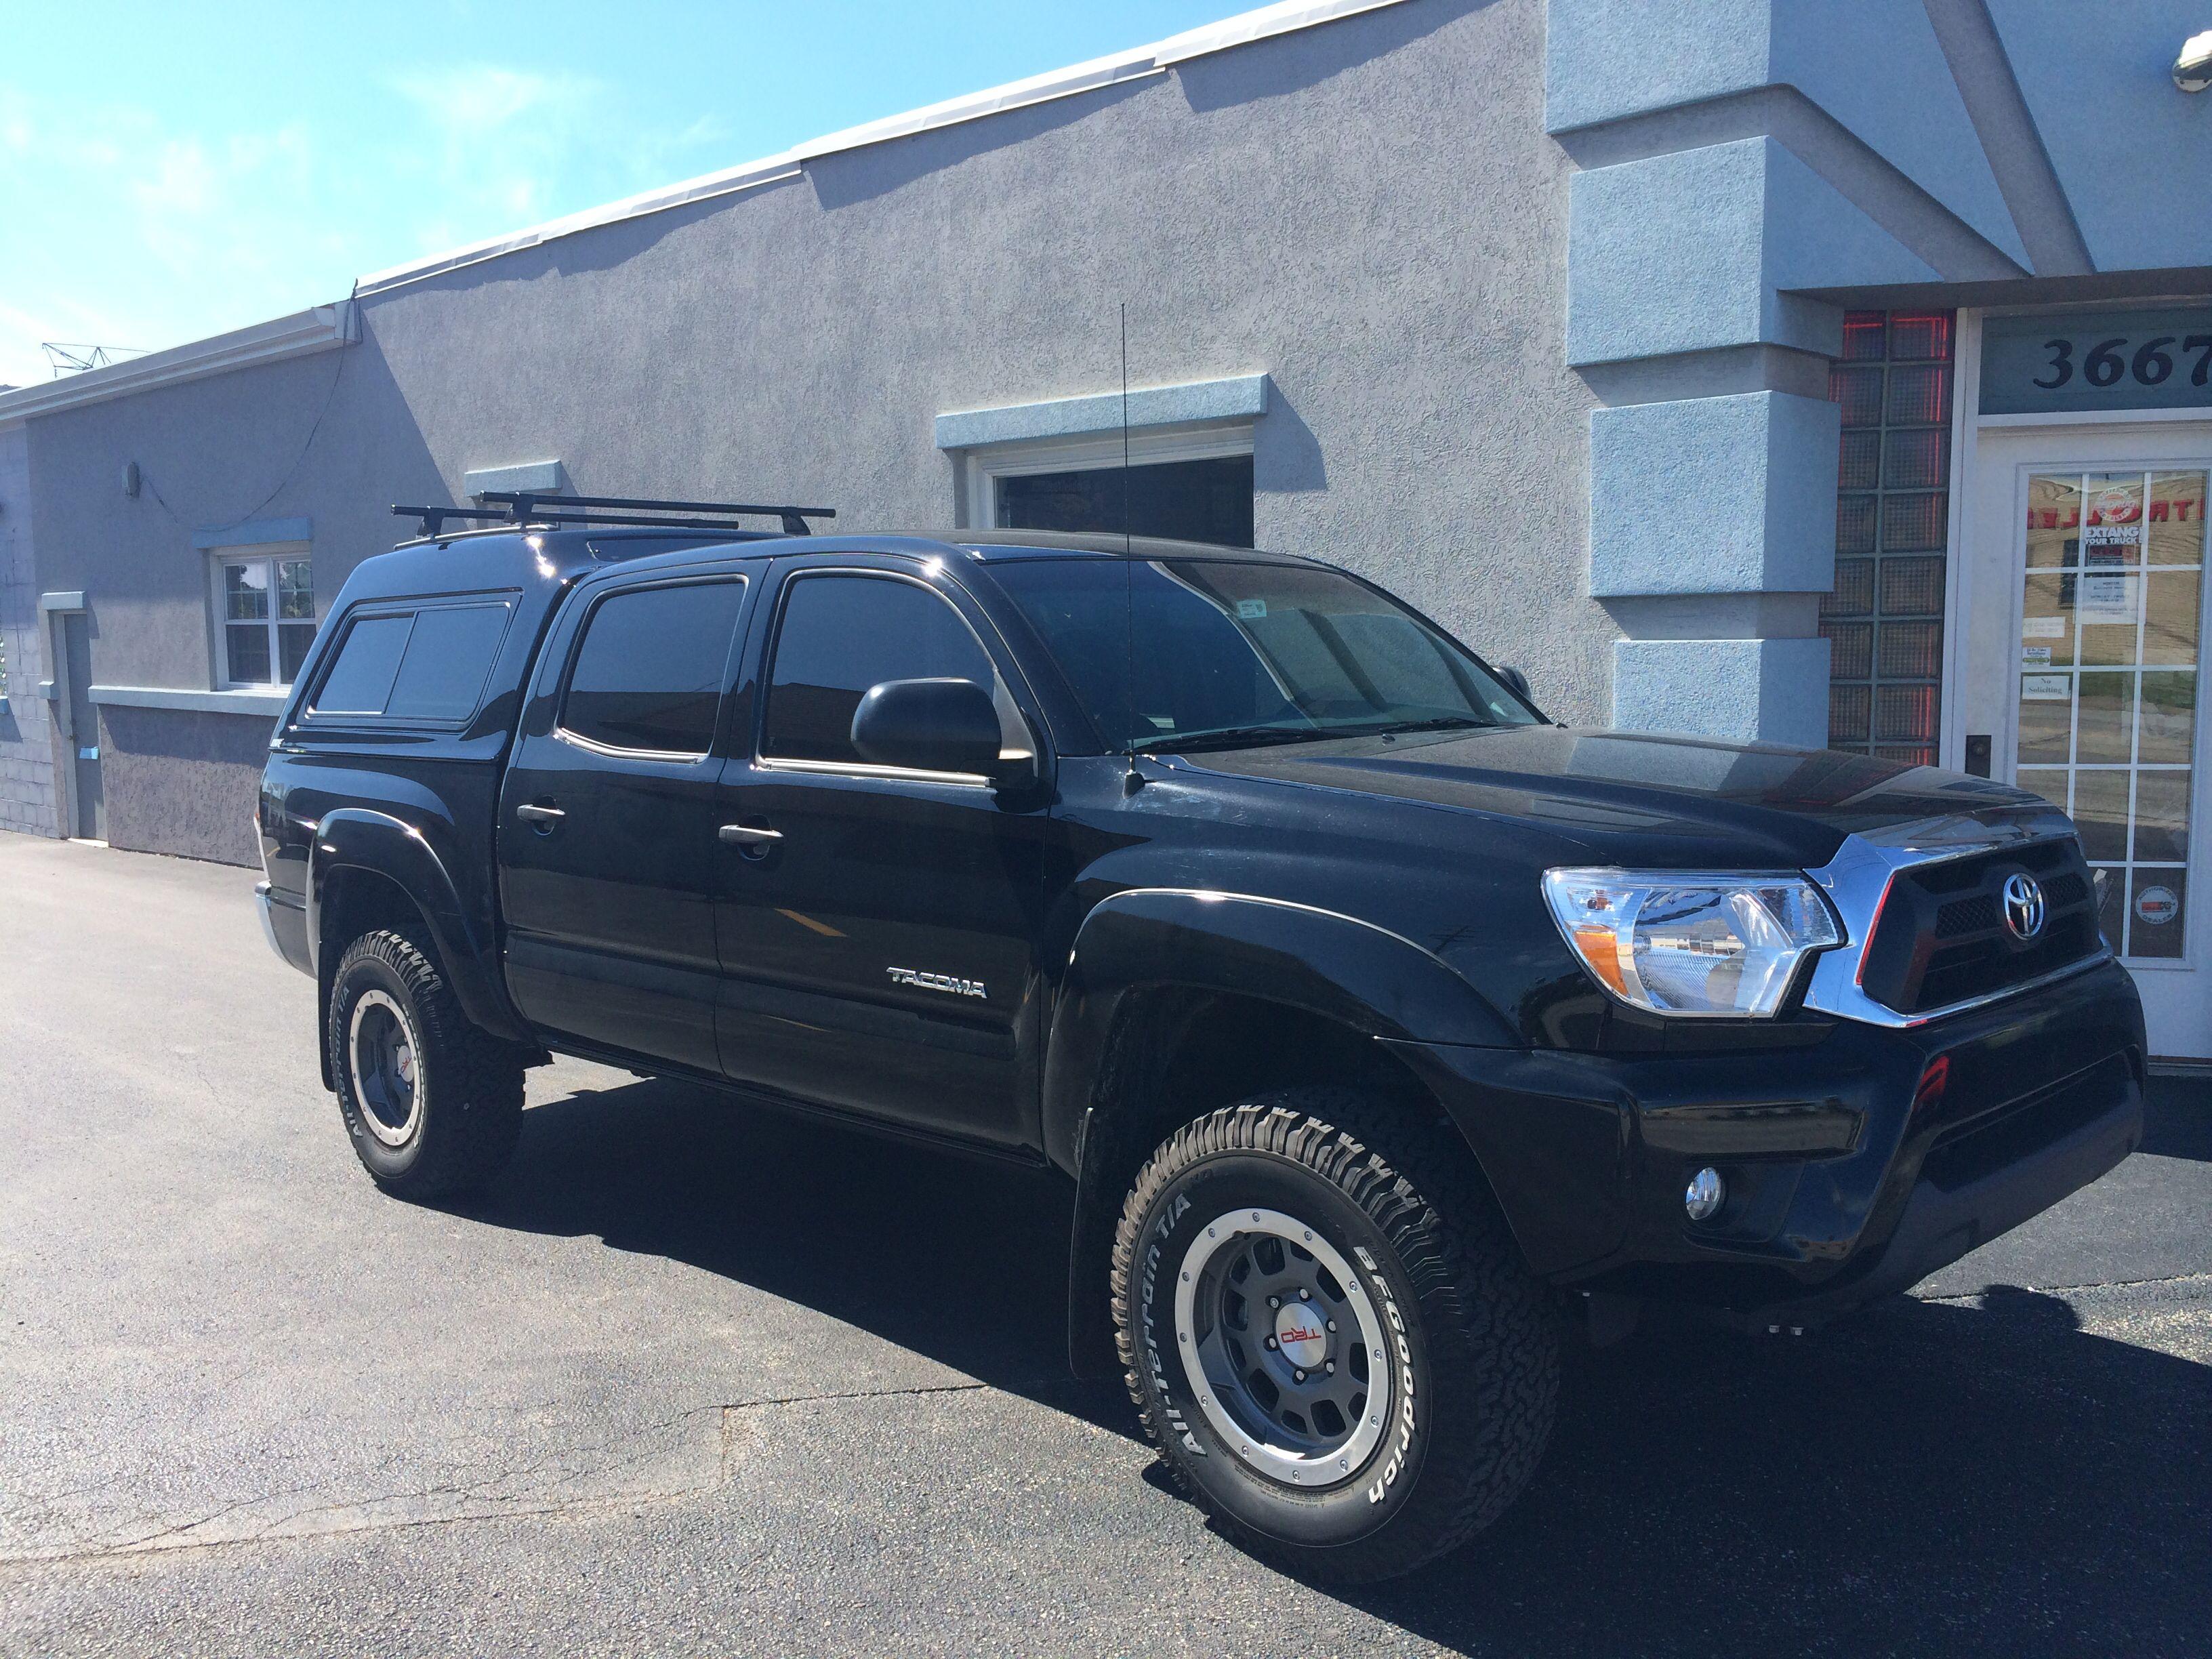 Toyota Tacoma Truck Cap >> Mod 2 For My Toyota Tacoma Baja Trd Rx Model A R E Truck Cap